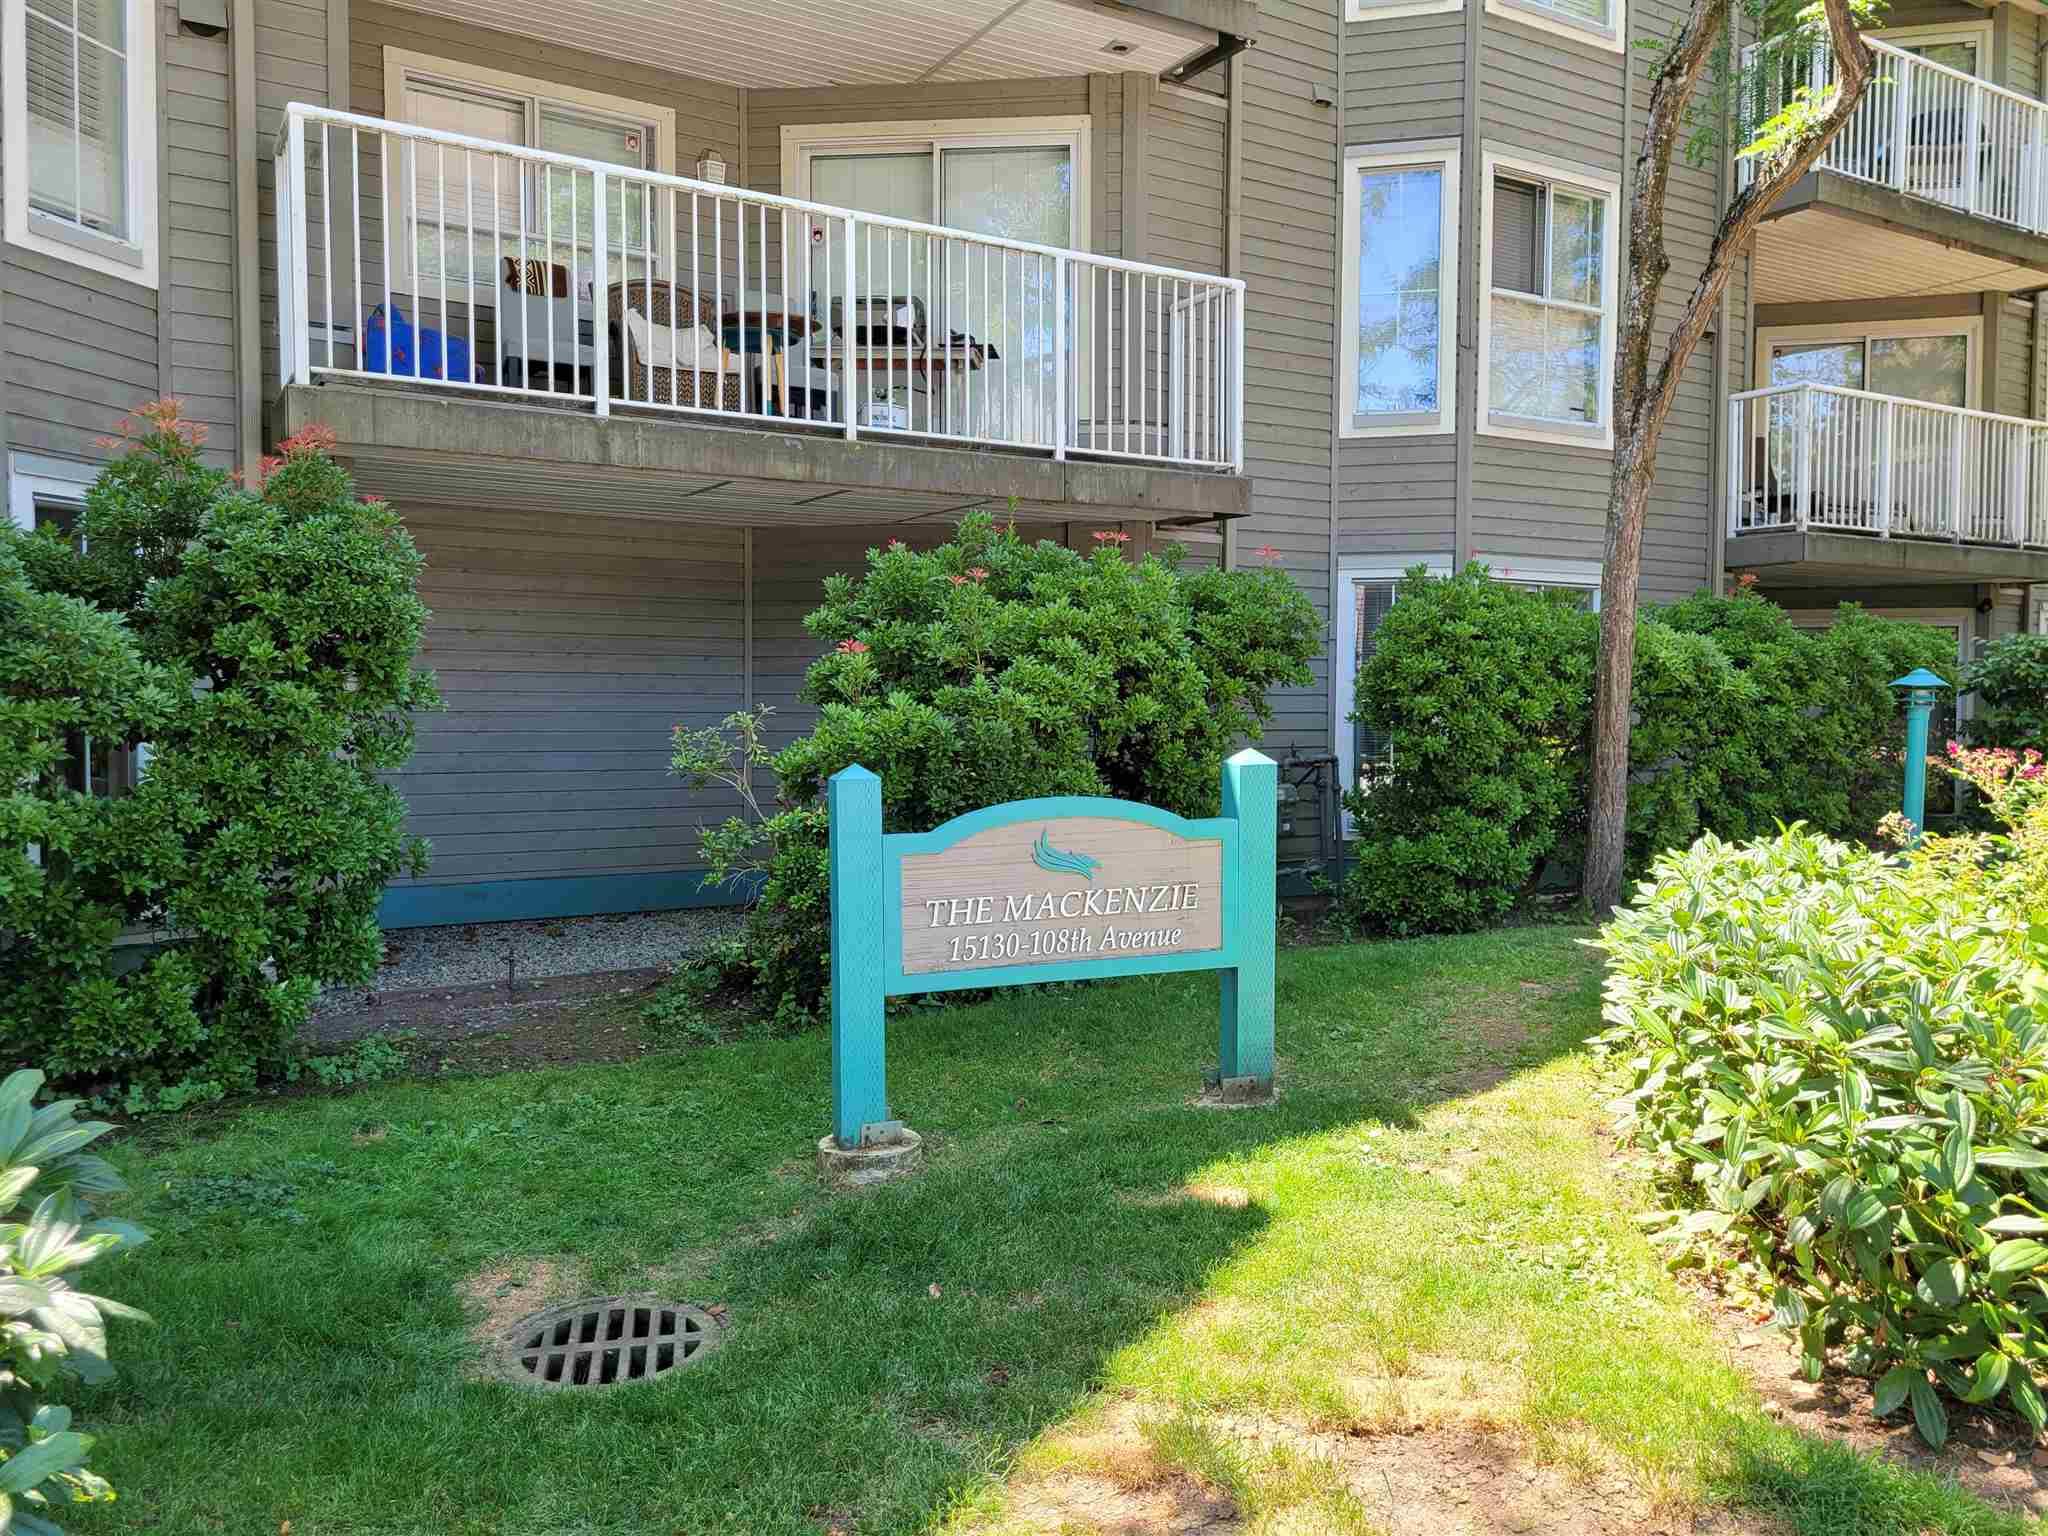 309 15130 108 AVENUE - Guildford Apartment/Condo for sale, 1 Bedroom (R2602867)